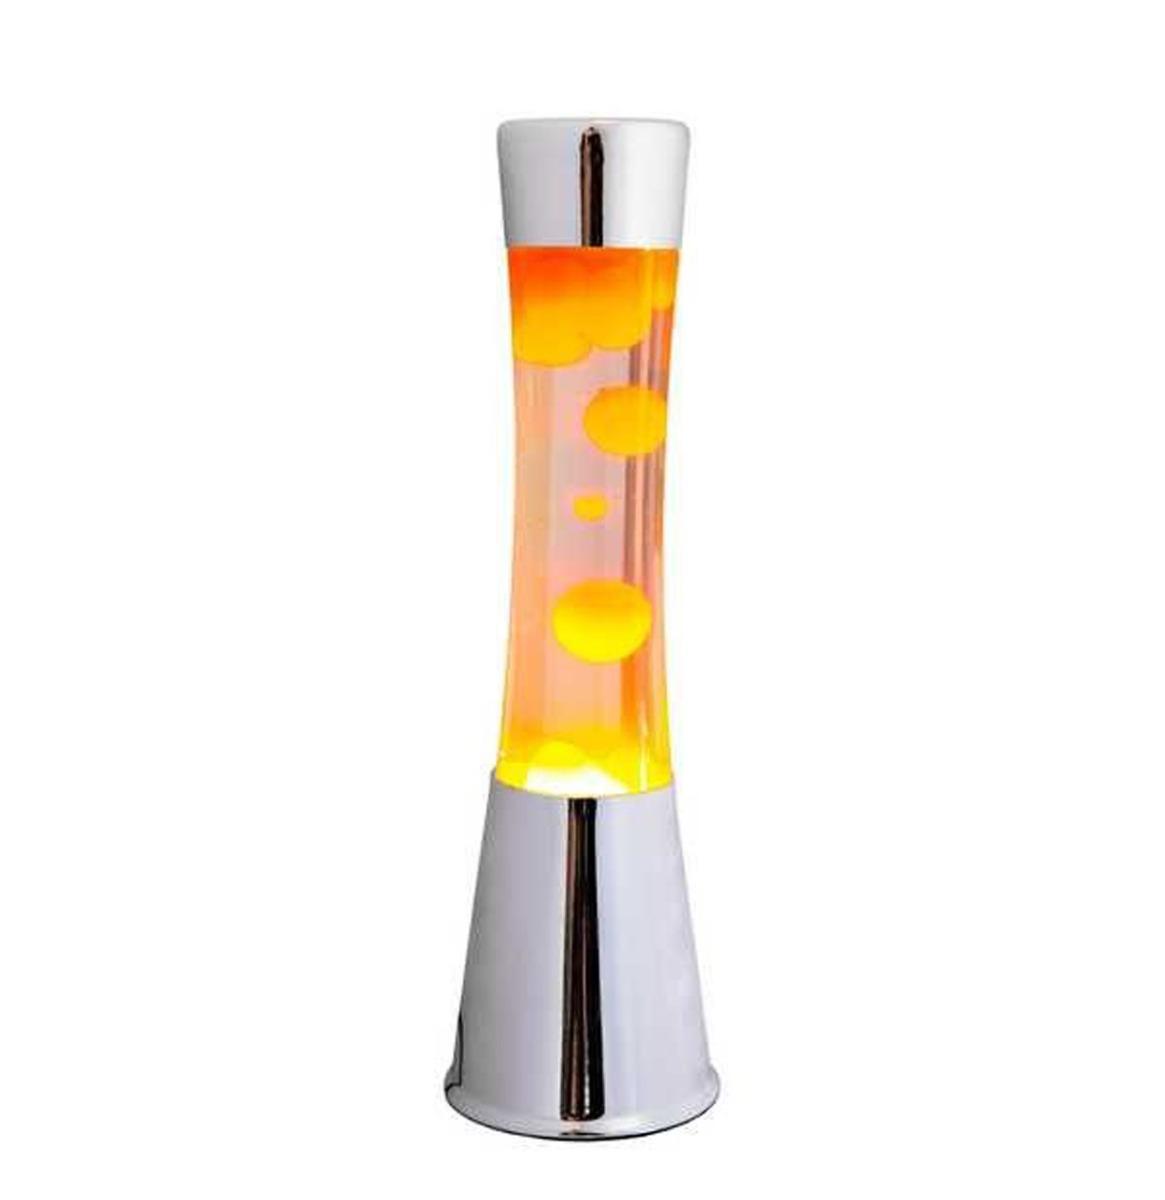 Fisura Lava Lamp - Chroom Met Oranje Lava